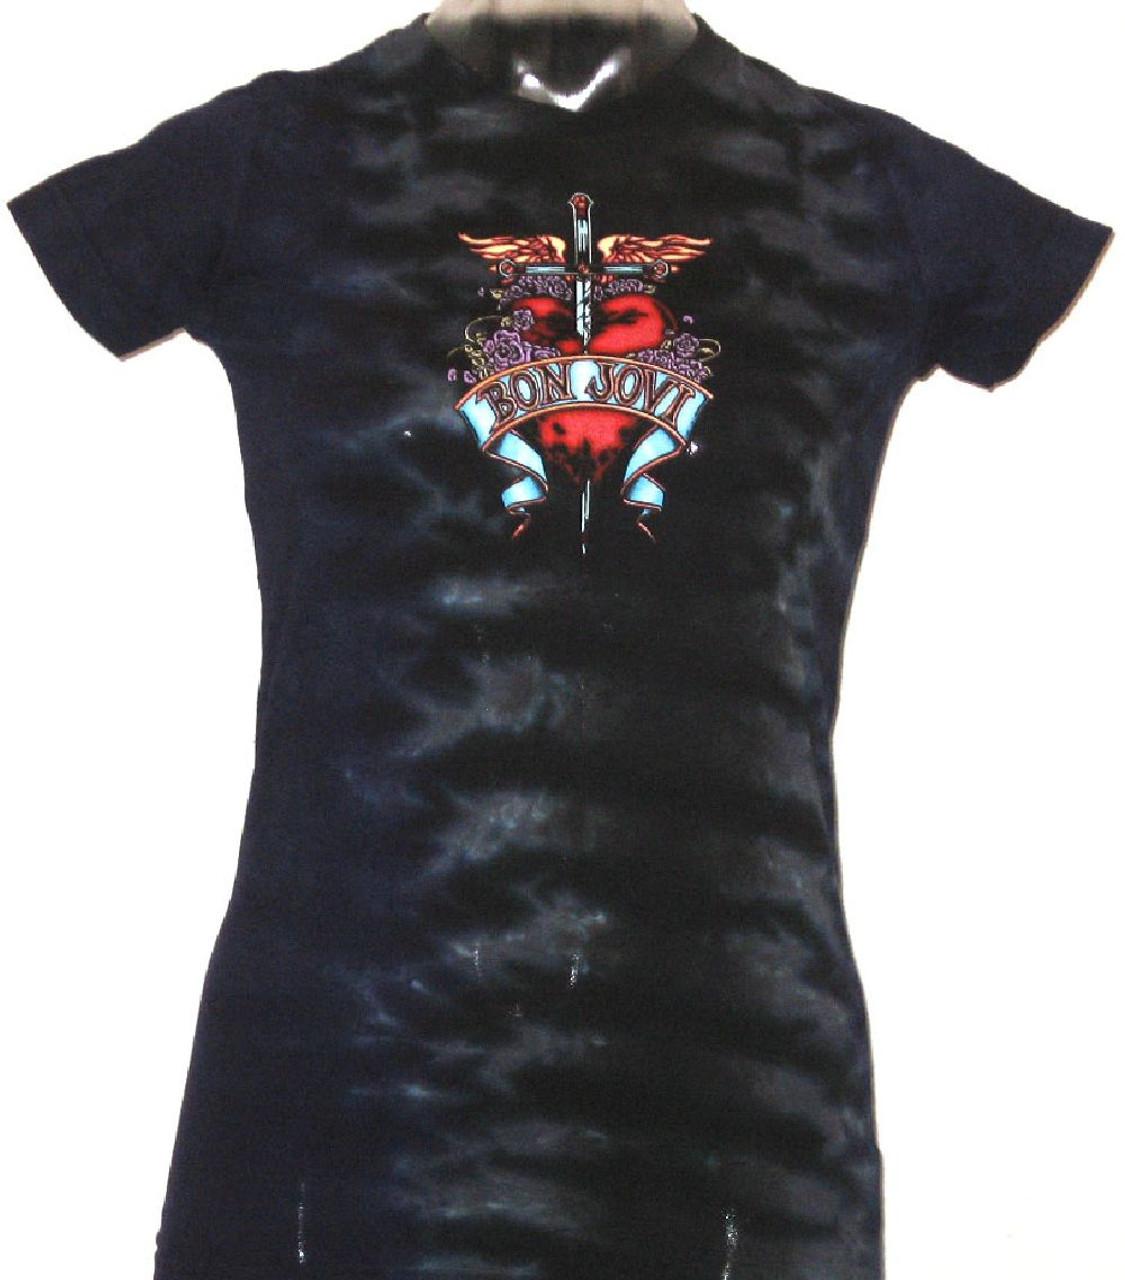 bon jovi tshirt heart and dagger logo womens tie dye